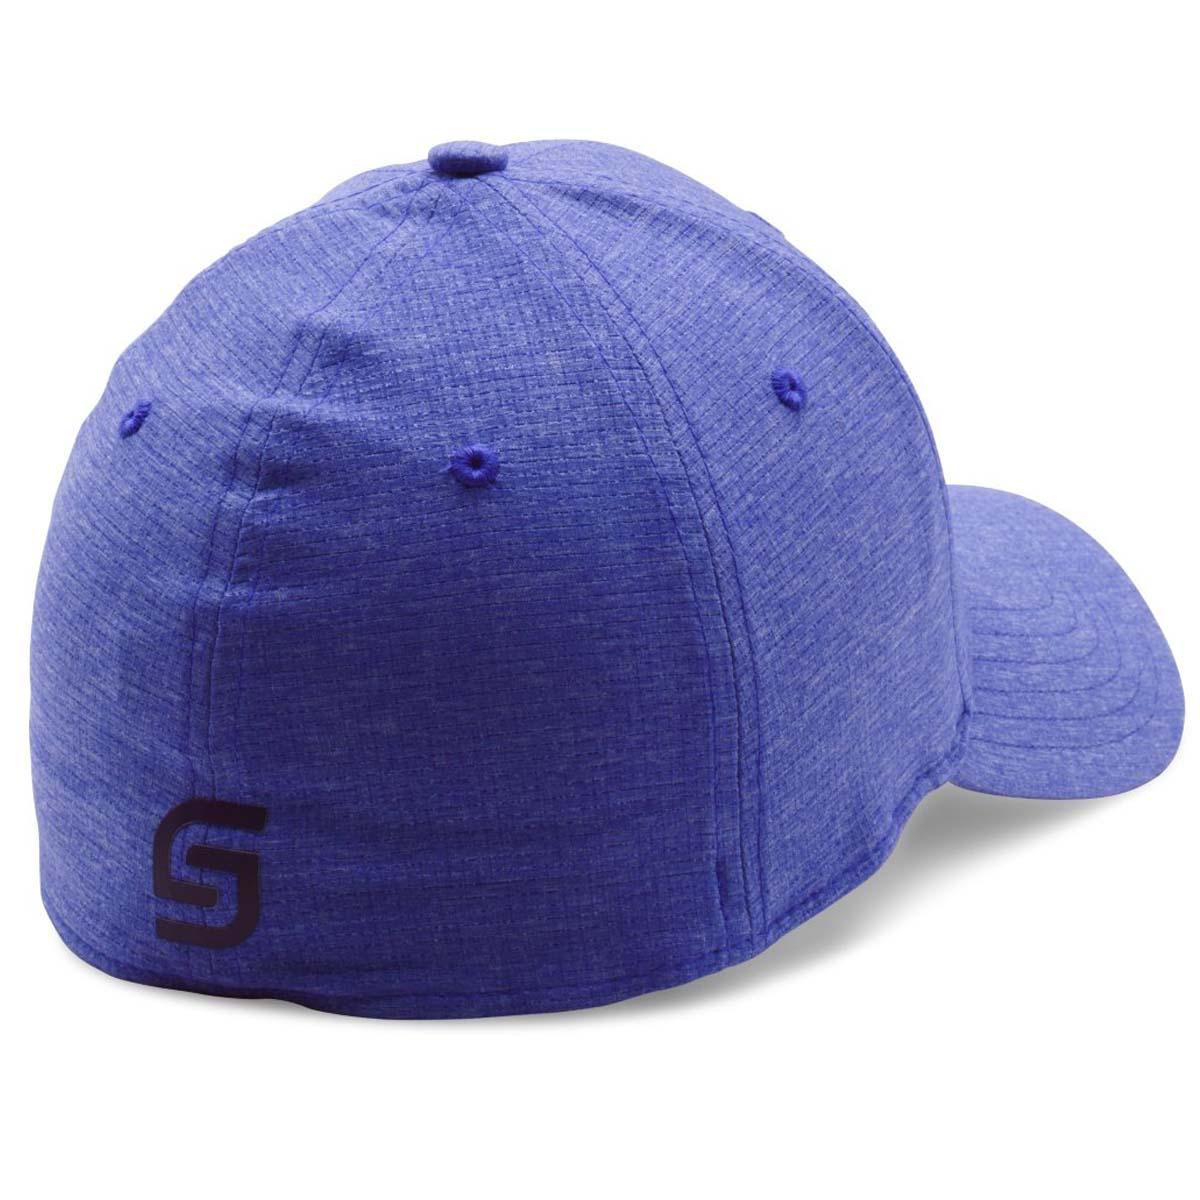 a1b3b287997a Under Armour Mens UA JS Tour Cap Stretch Fit Jordan Spieth Golf Hat ...